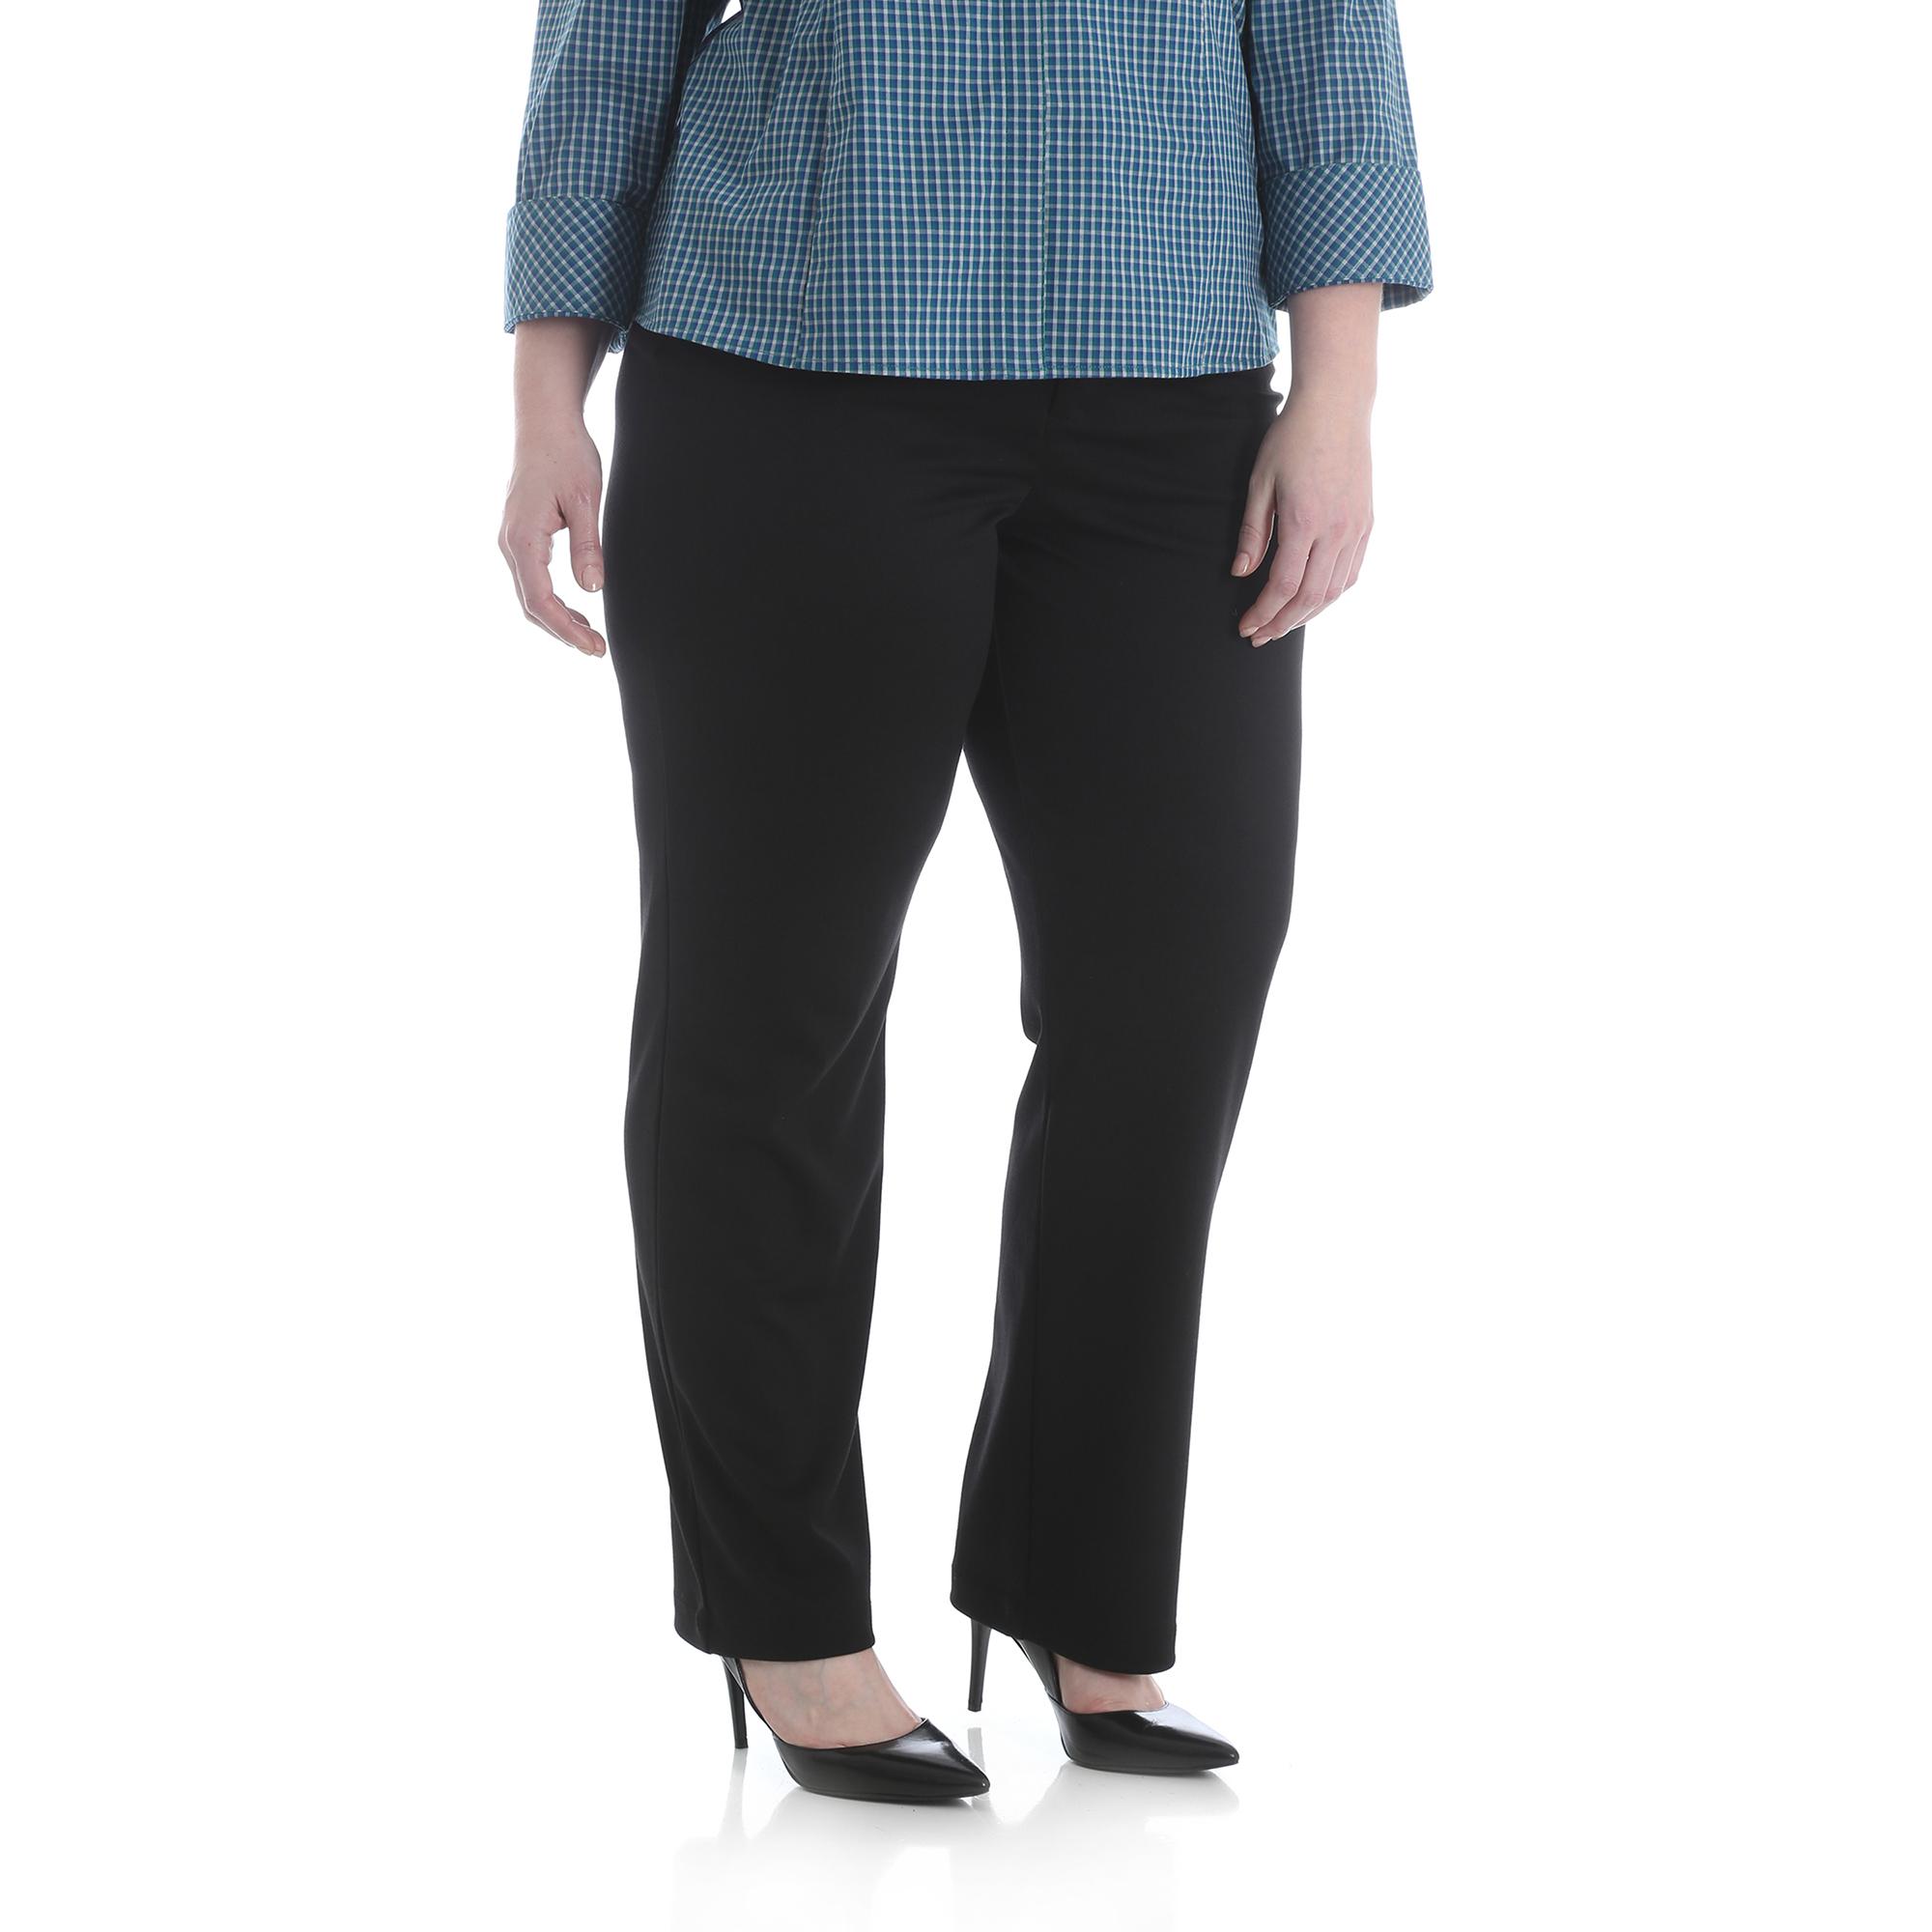 158ZN08 - Knit Trouser